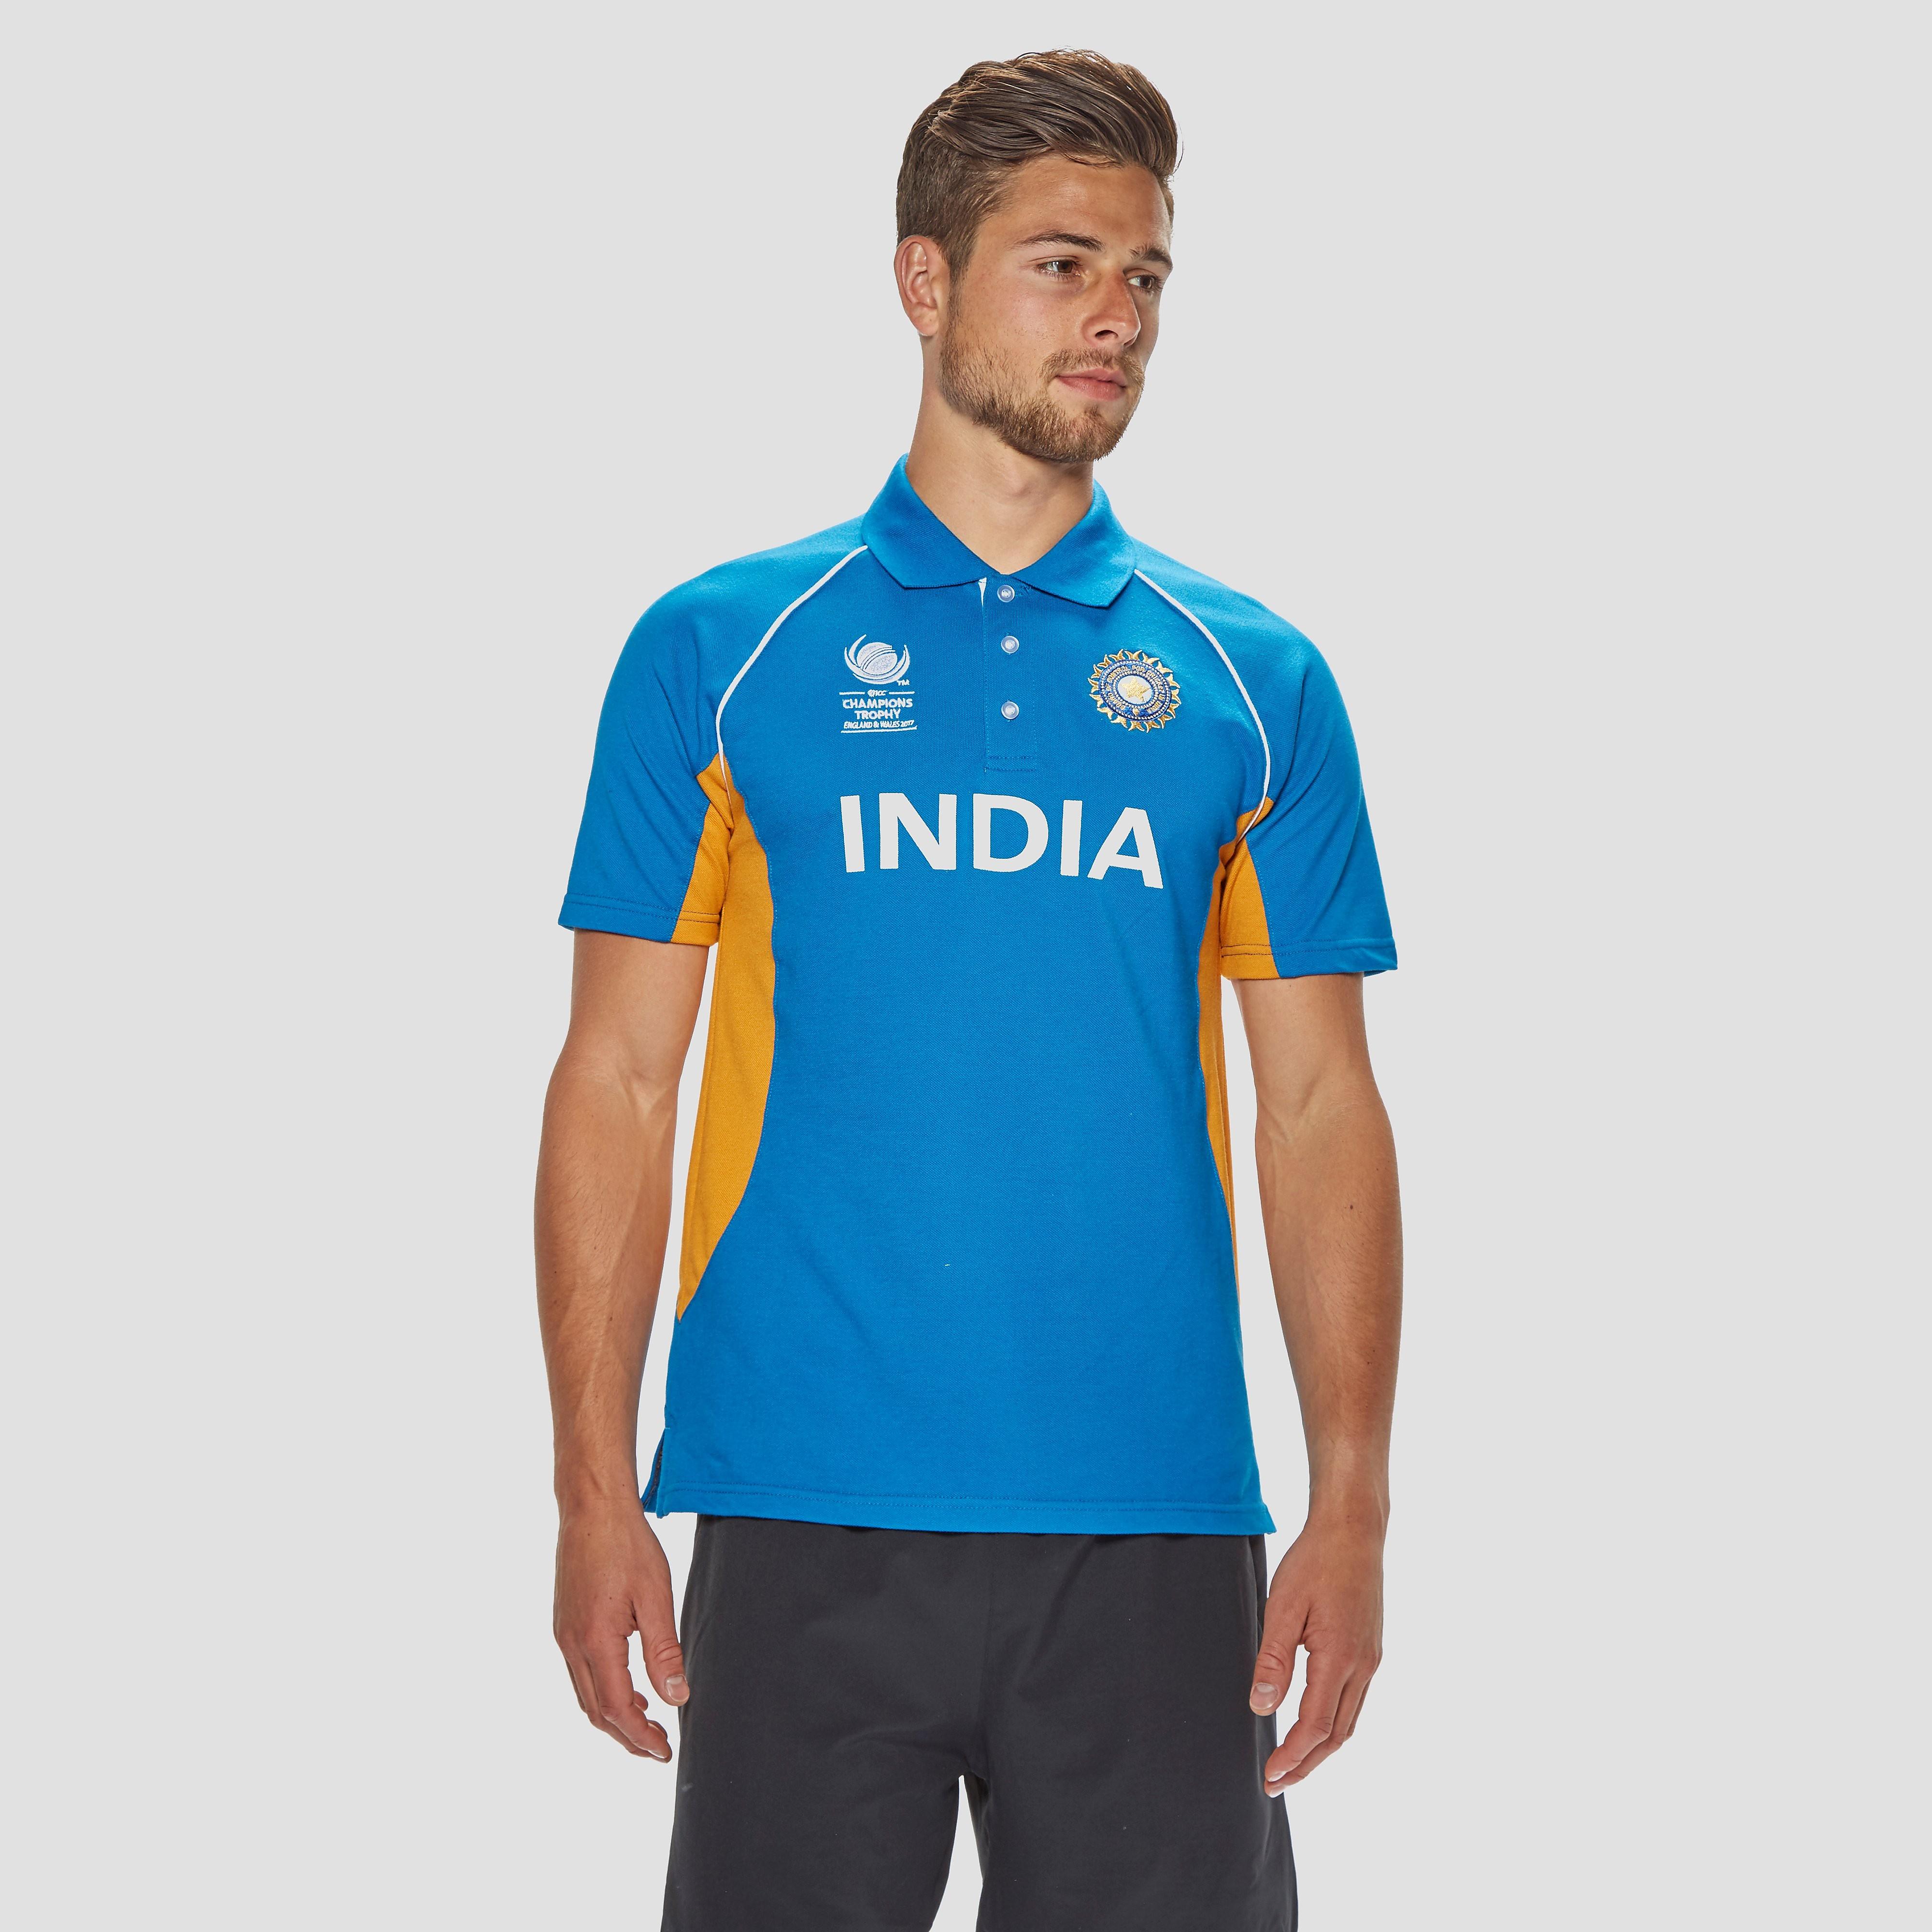 Sportfolio ICC Champions Trophy 2017 India Men's Cricket Jersey